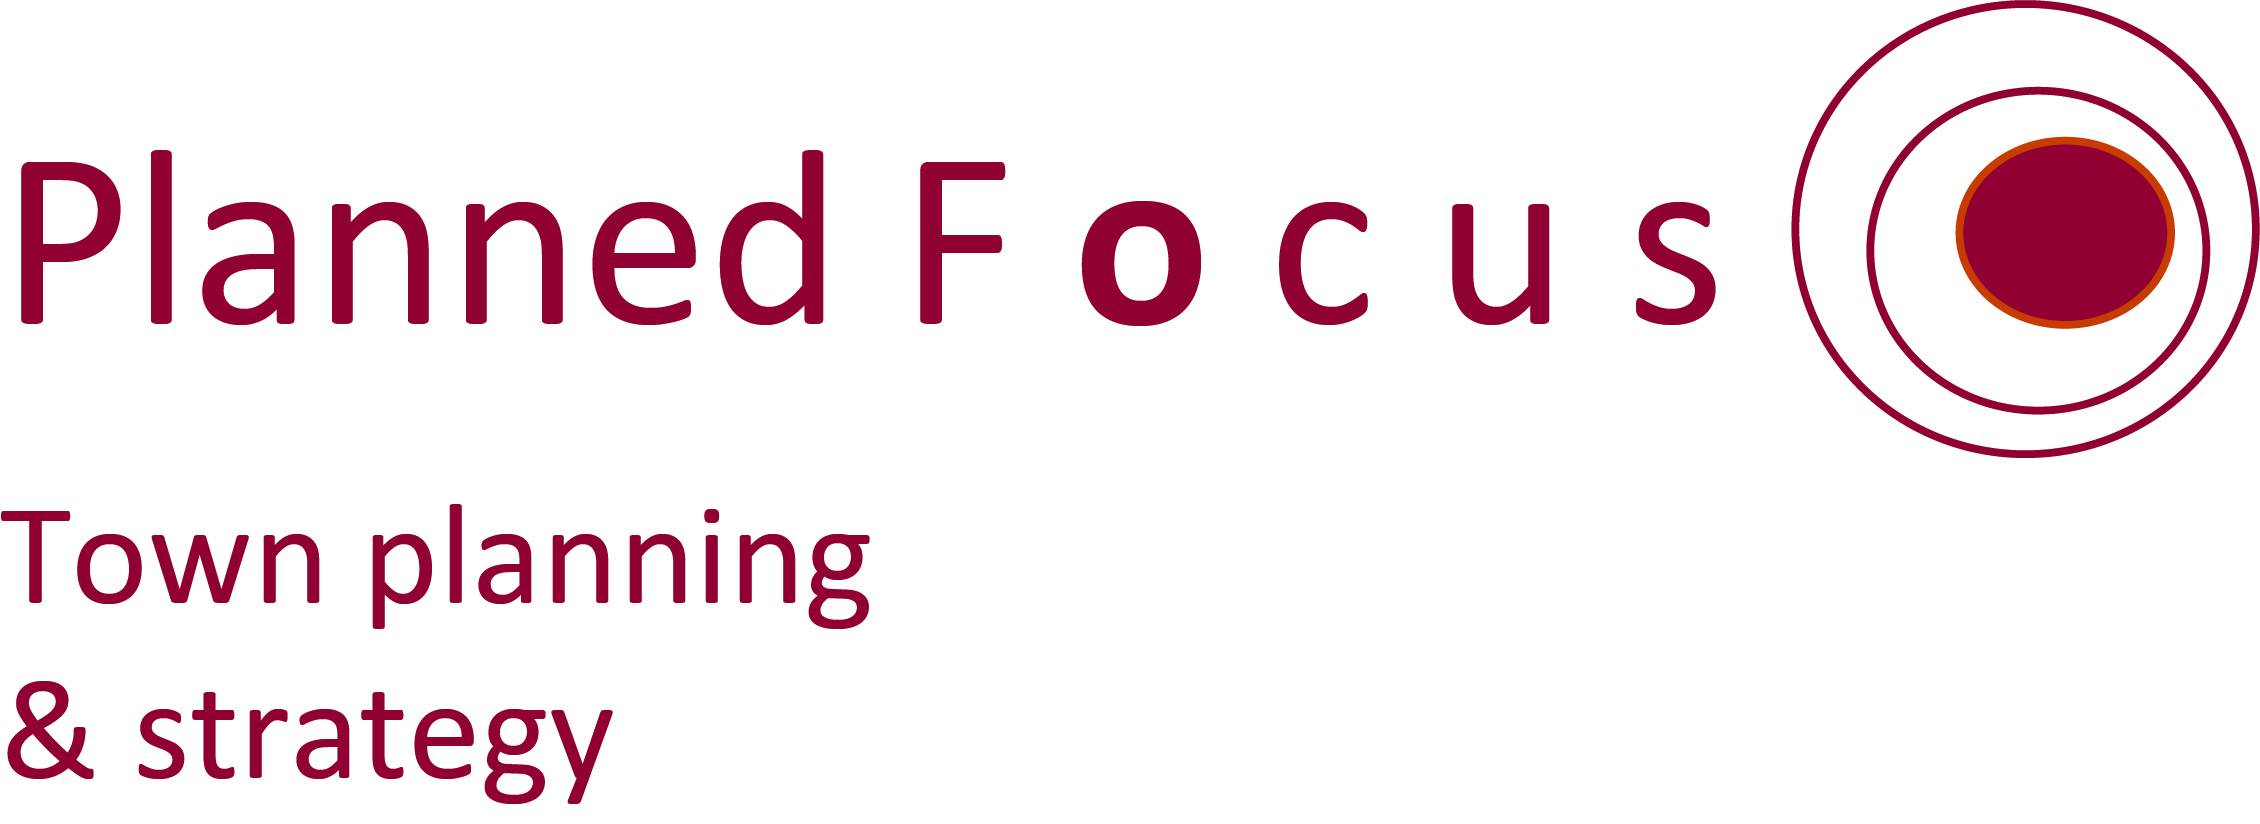 Planned Focus